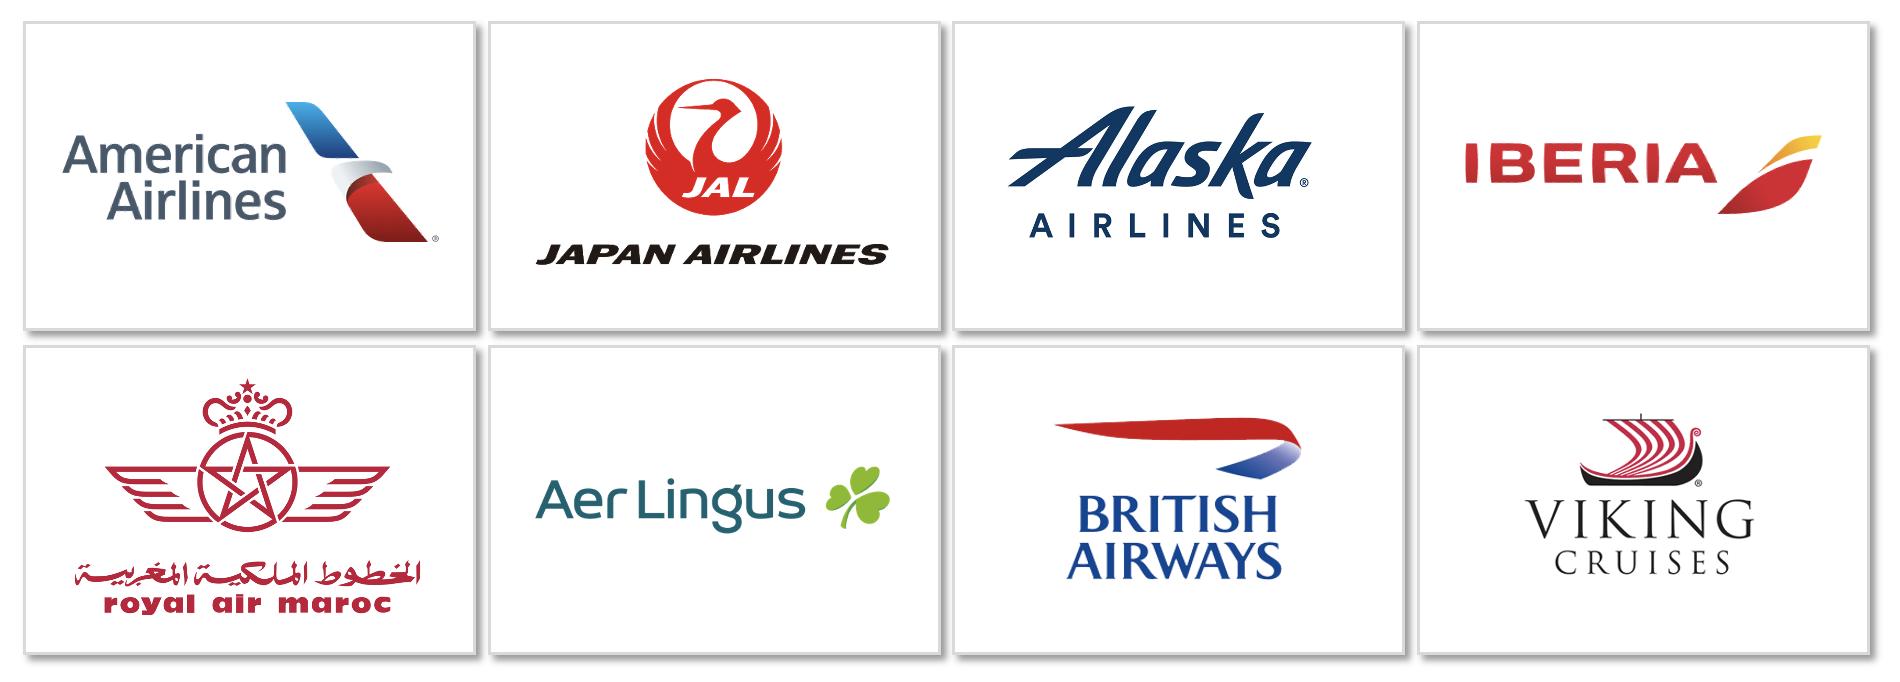 VeriFLY Travel Logos IMG 080621